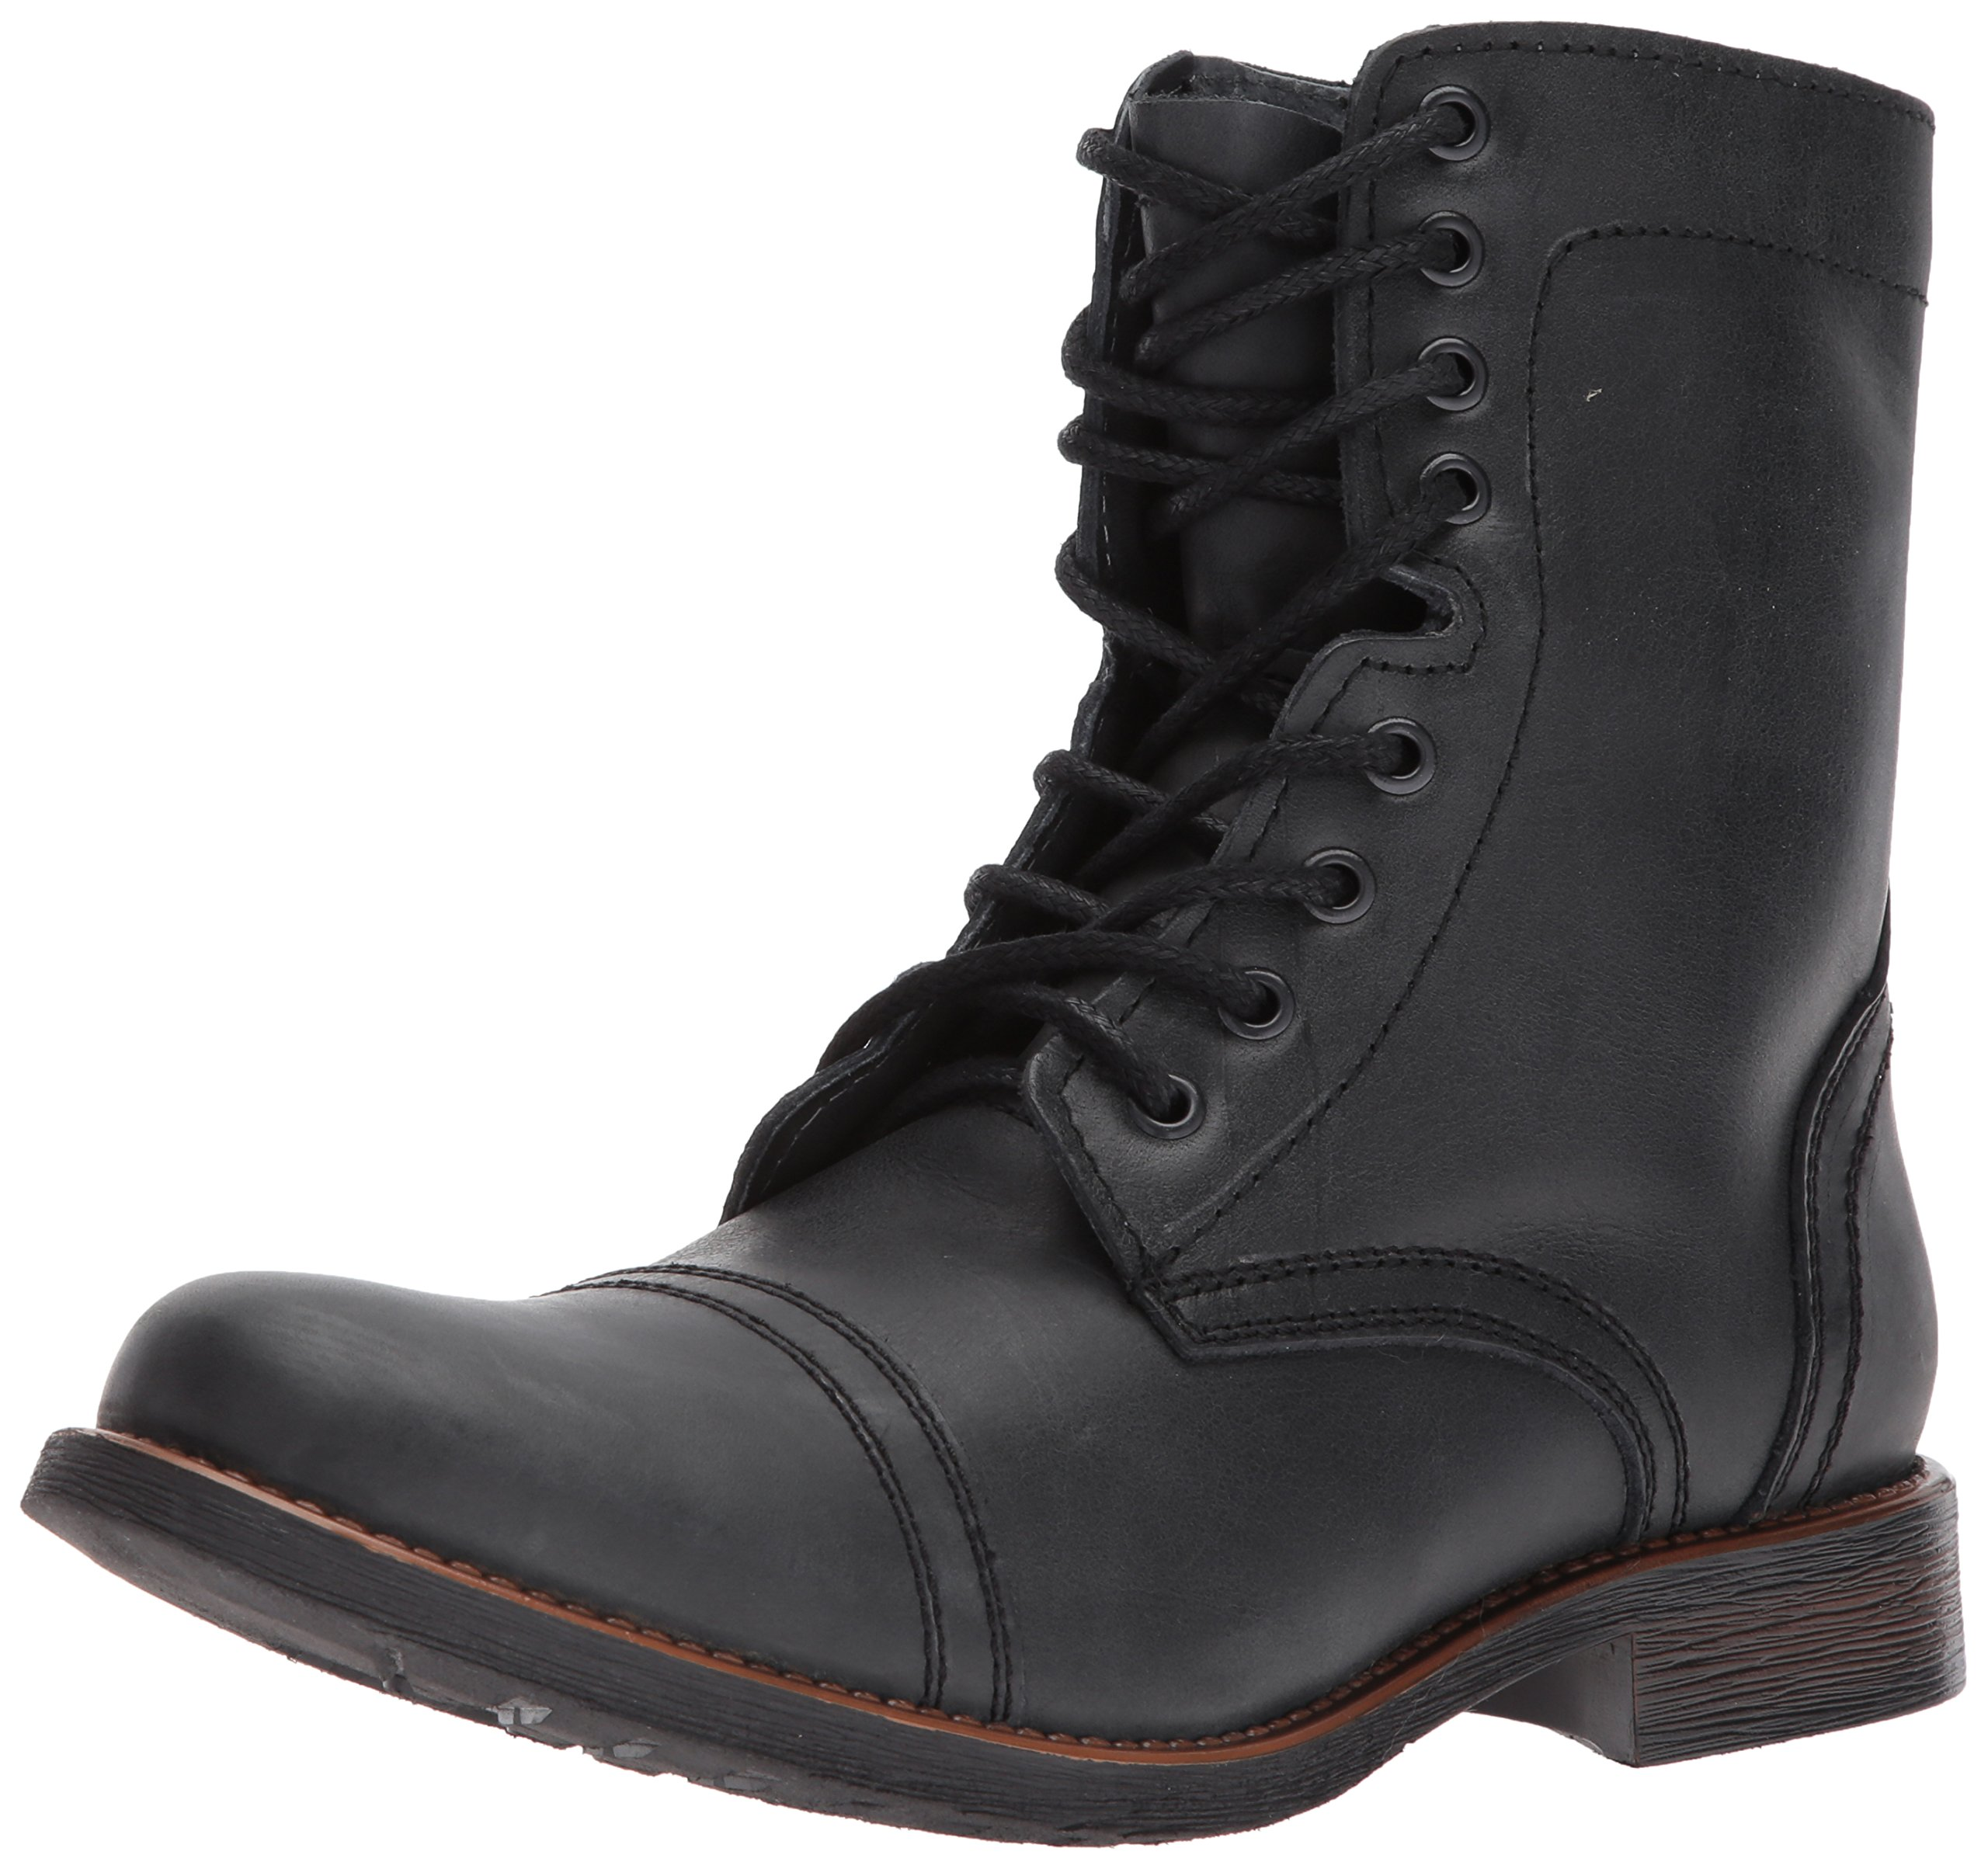 Steve Madden Men's TROOPAH-C Combat Boot, Black Leather, 10.5 M US by Steve Madden